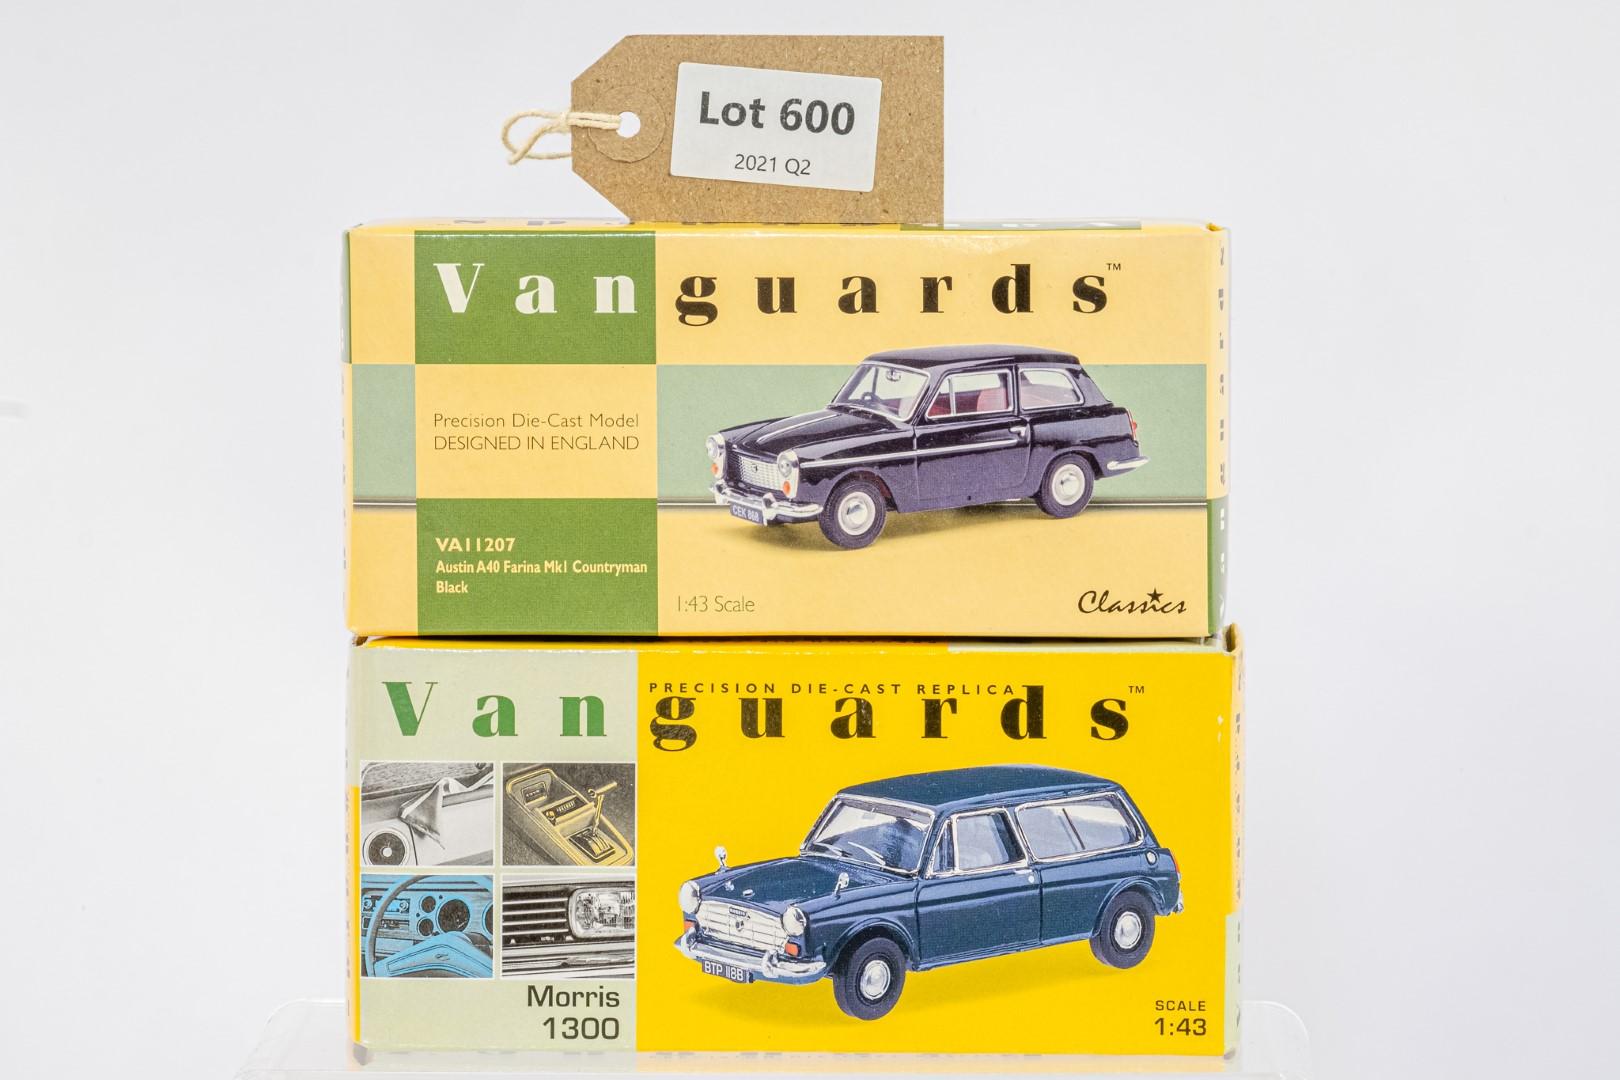 Vanguards Austin A40 Farina MkI Countryman - Black / Morris 1300 - Trafalgar Blue -